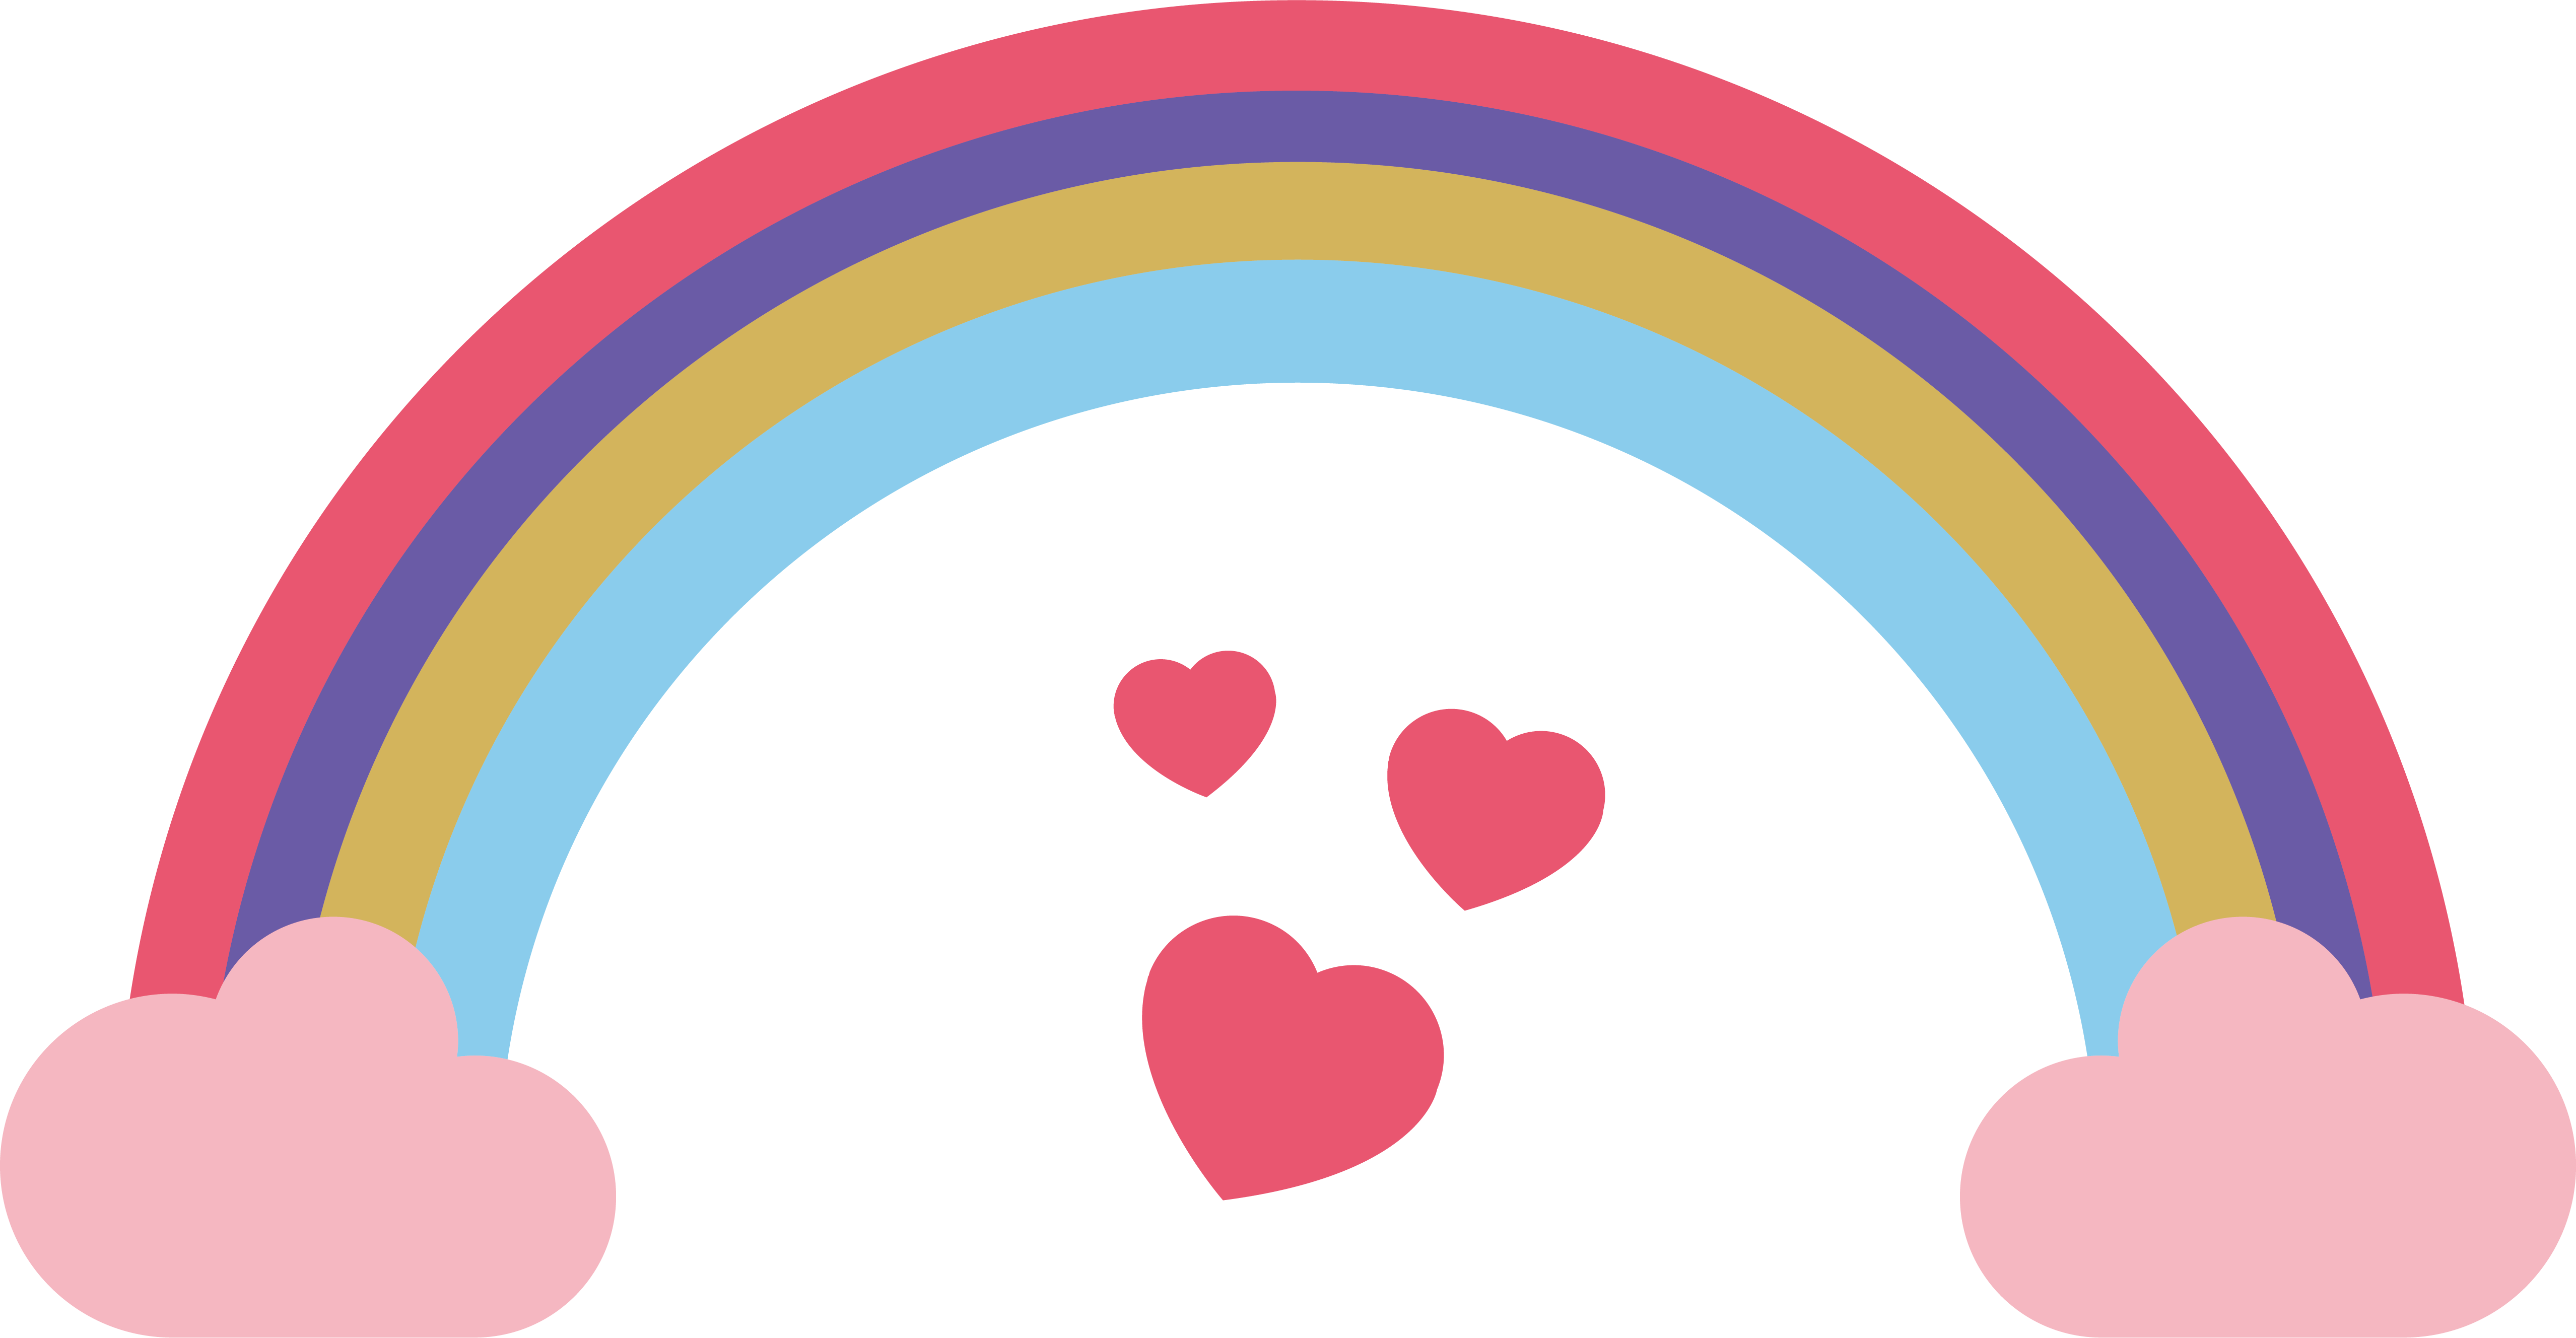 Bridge clip art beautiful. Donut clipart rainbow